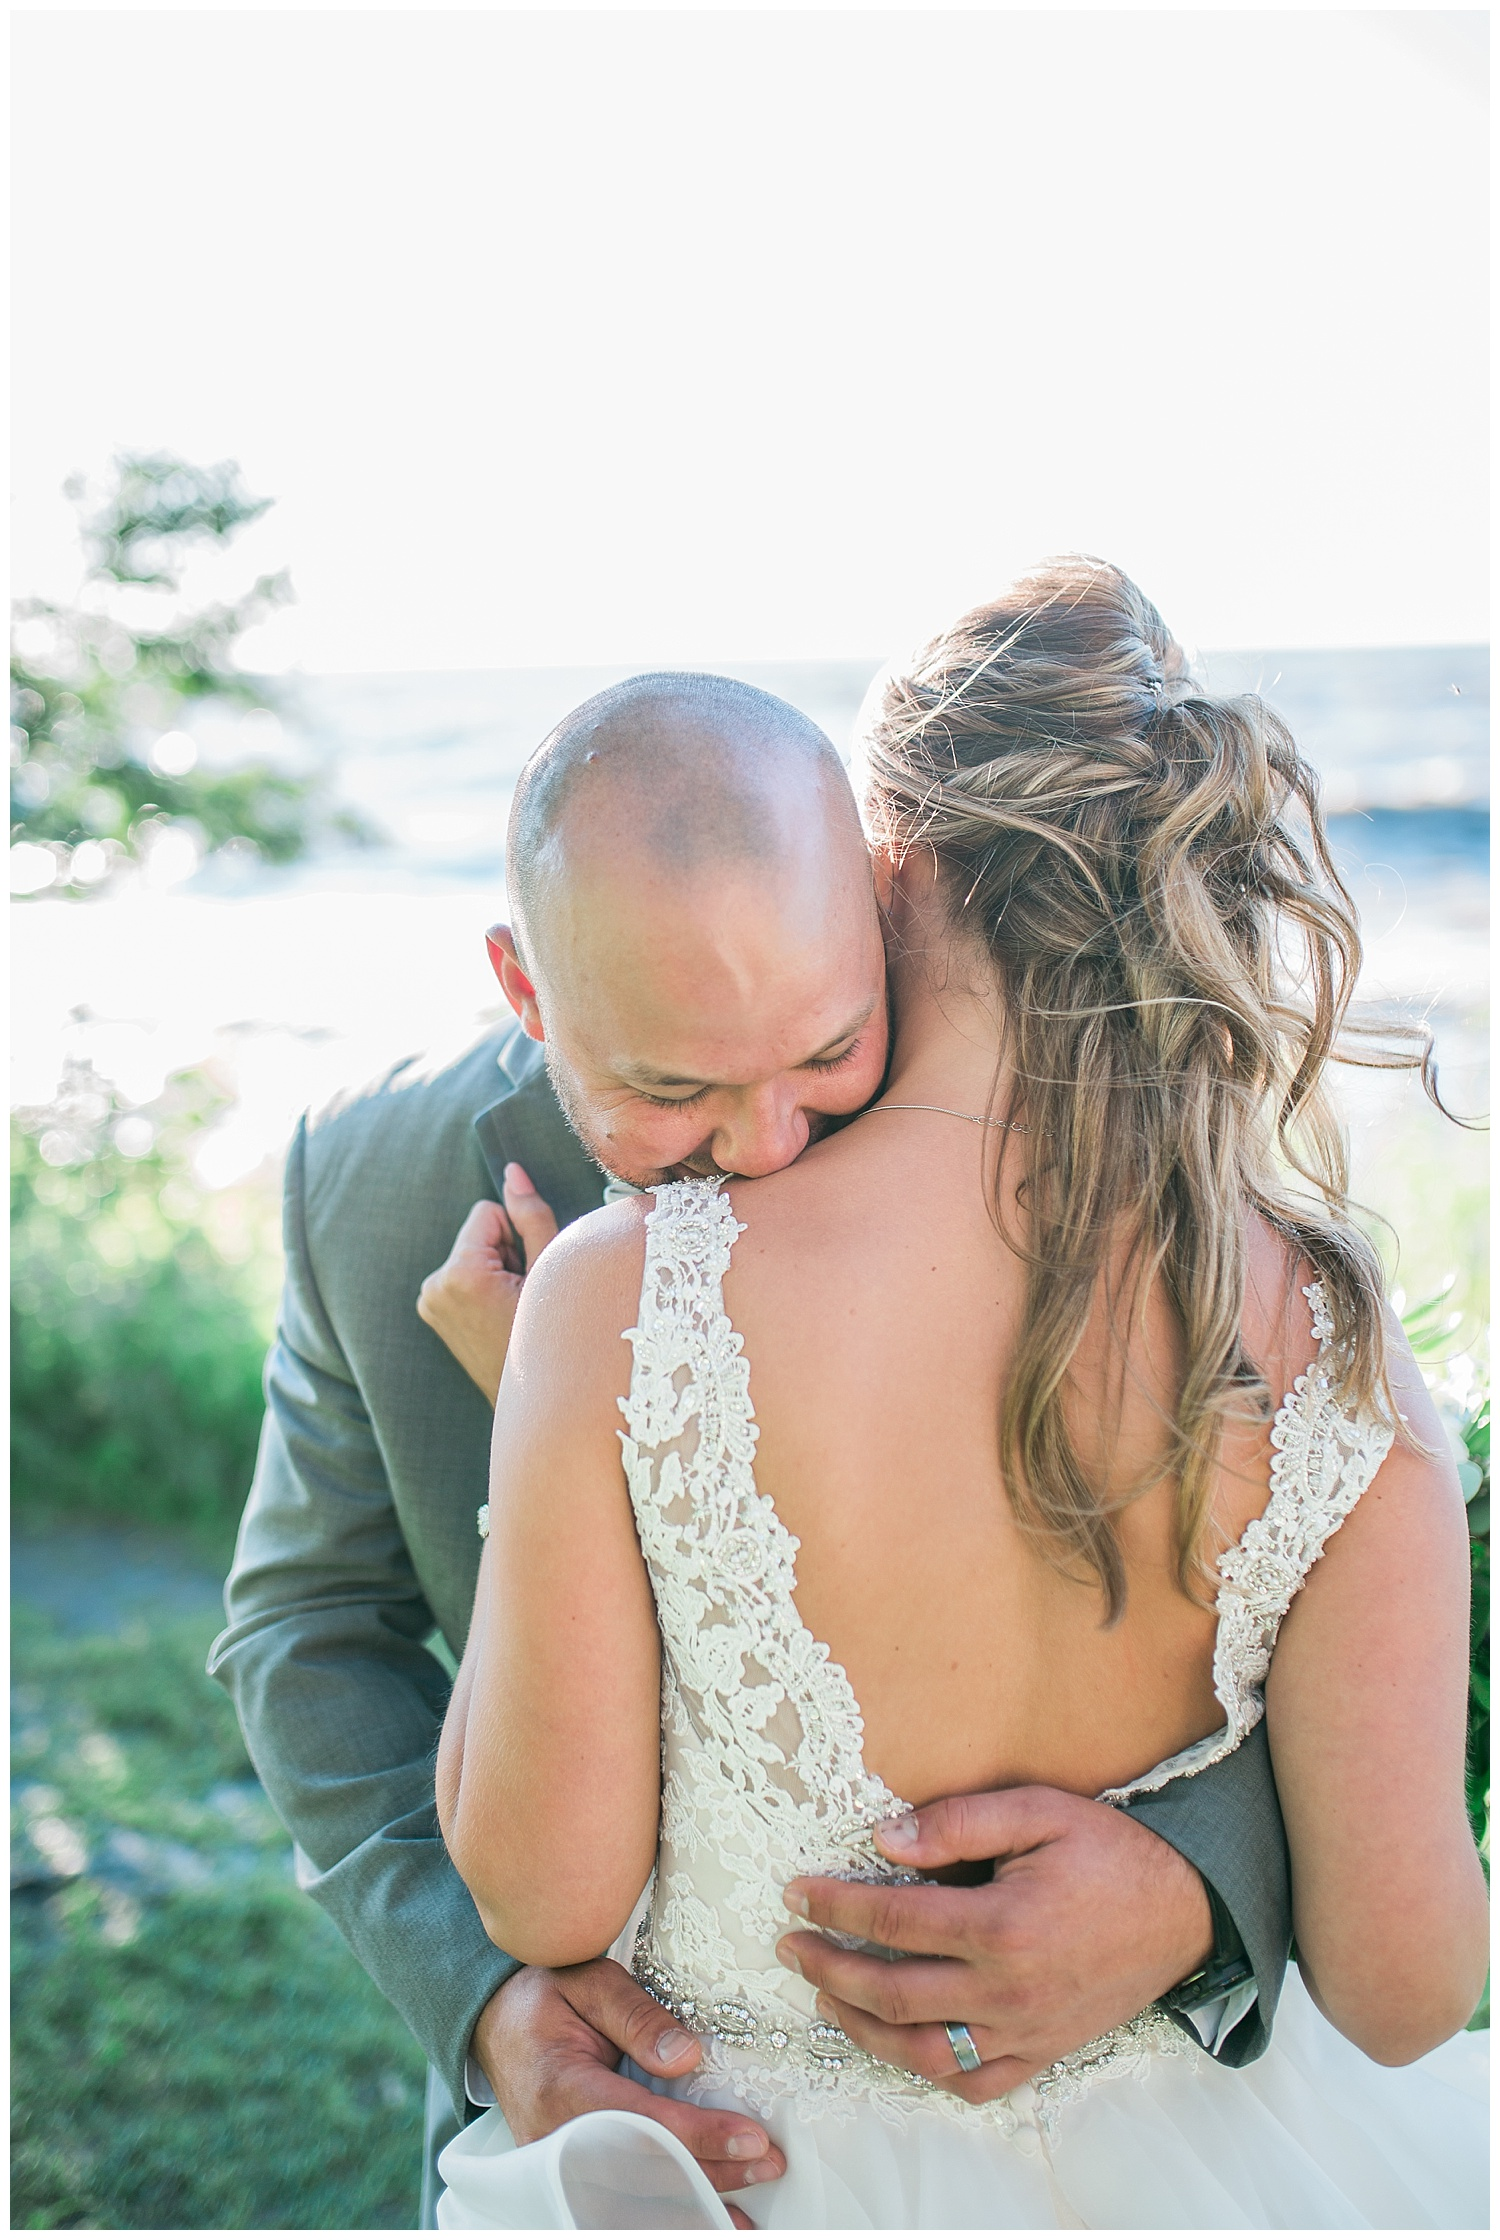 Sean and Andrea - Webster wedding - lass and beau-1057_Buffalo wedding photography.jpg